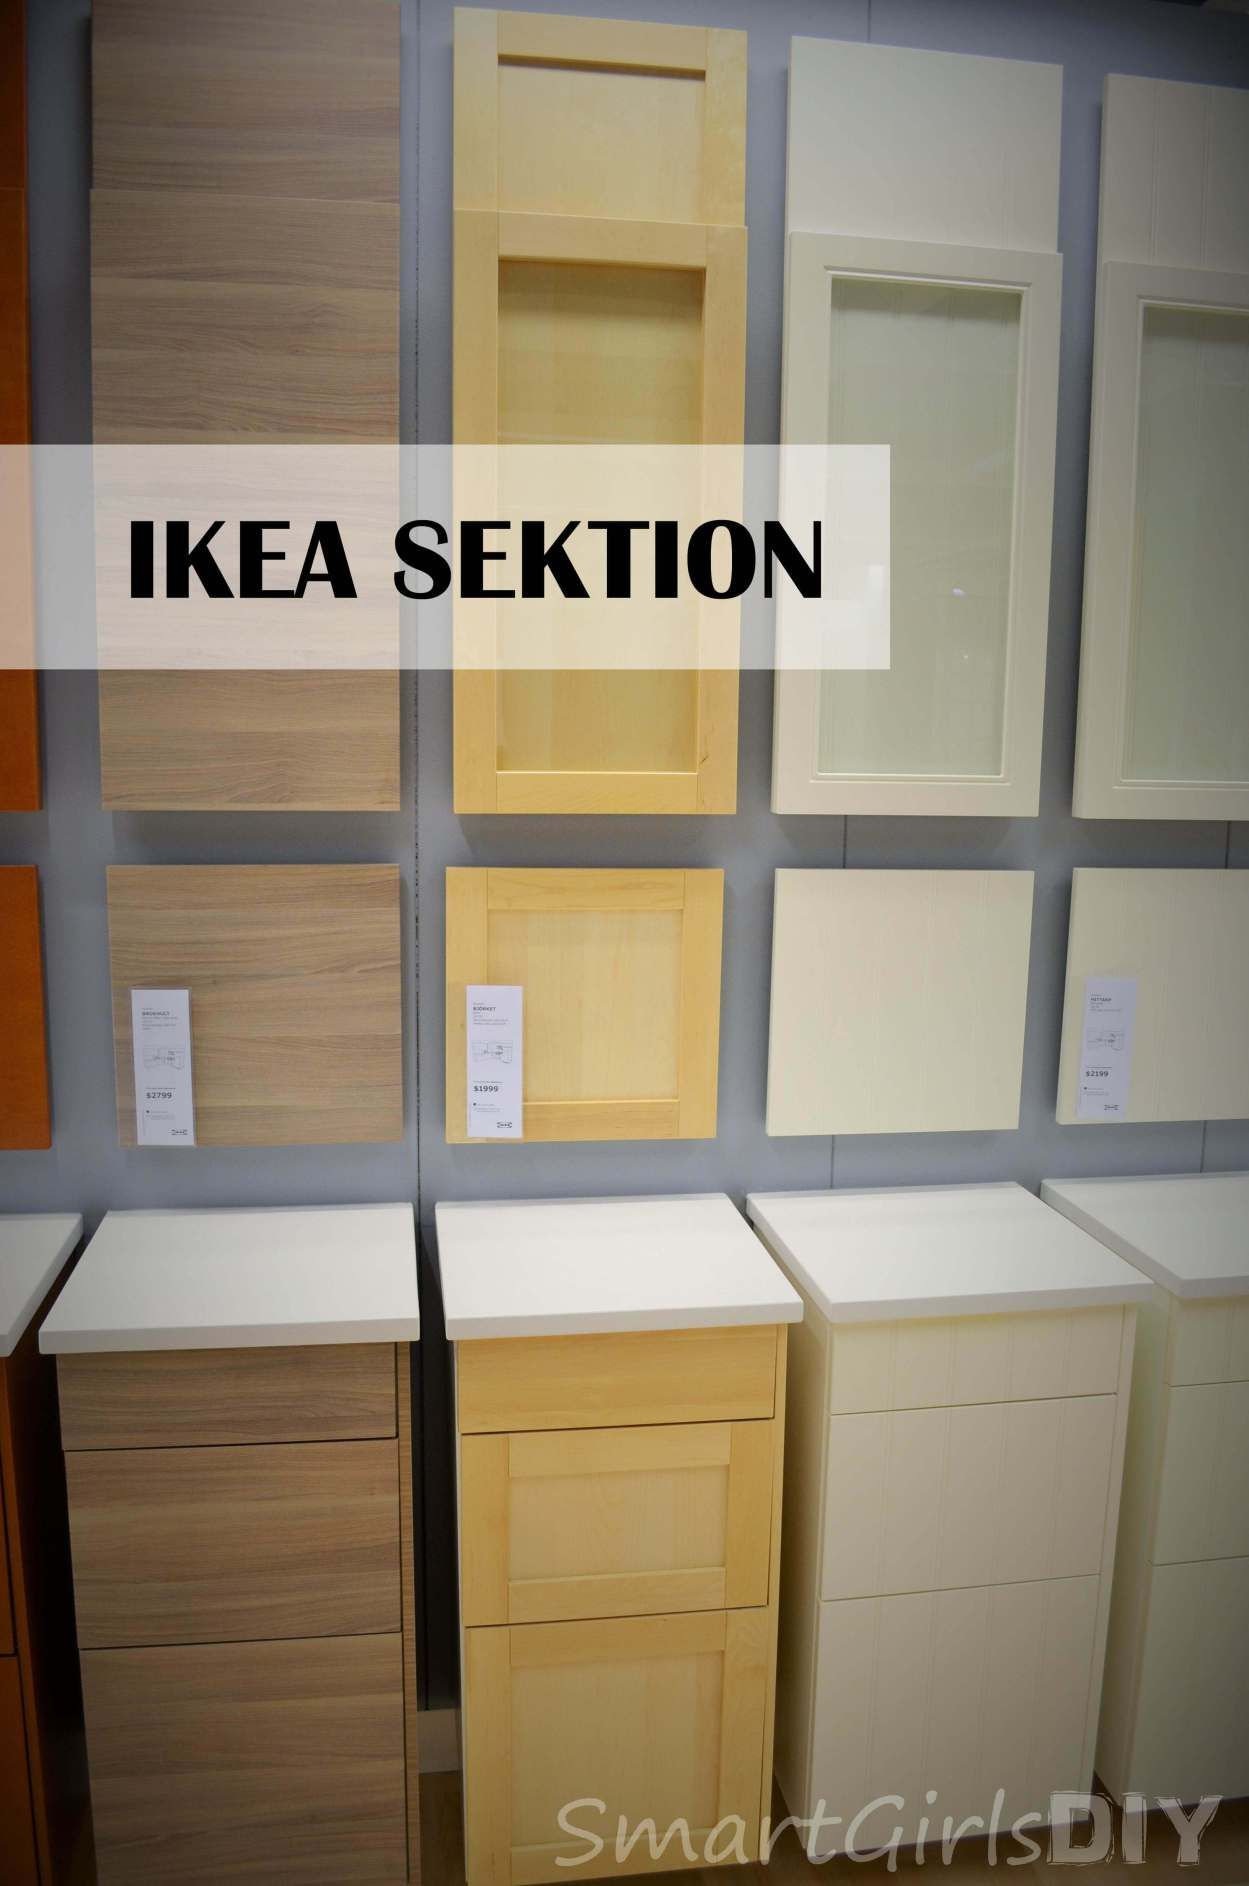 Ikea Sektion Door Fronts Ikea New Kitchen Buy Kitchen Cabinets Ikea Kitchen Cabinets